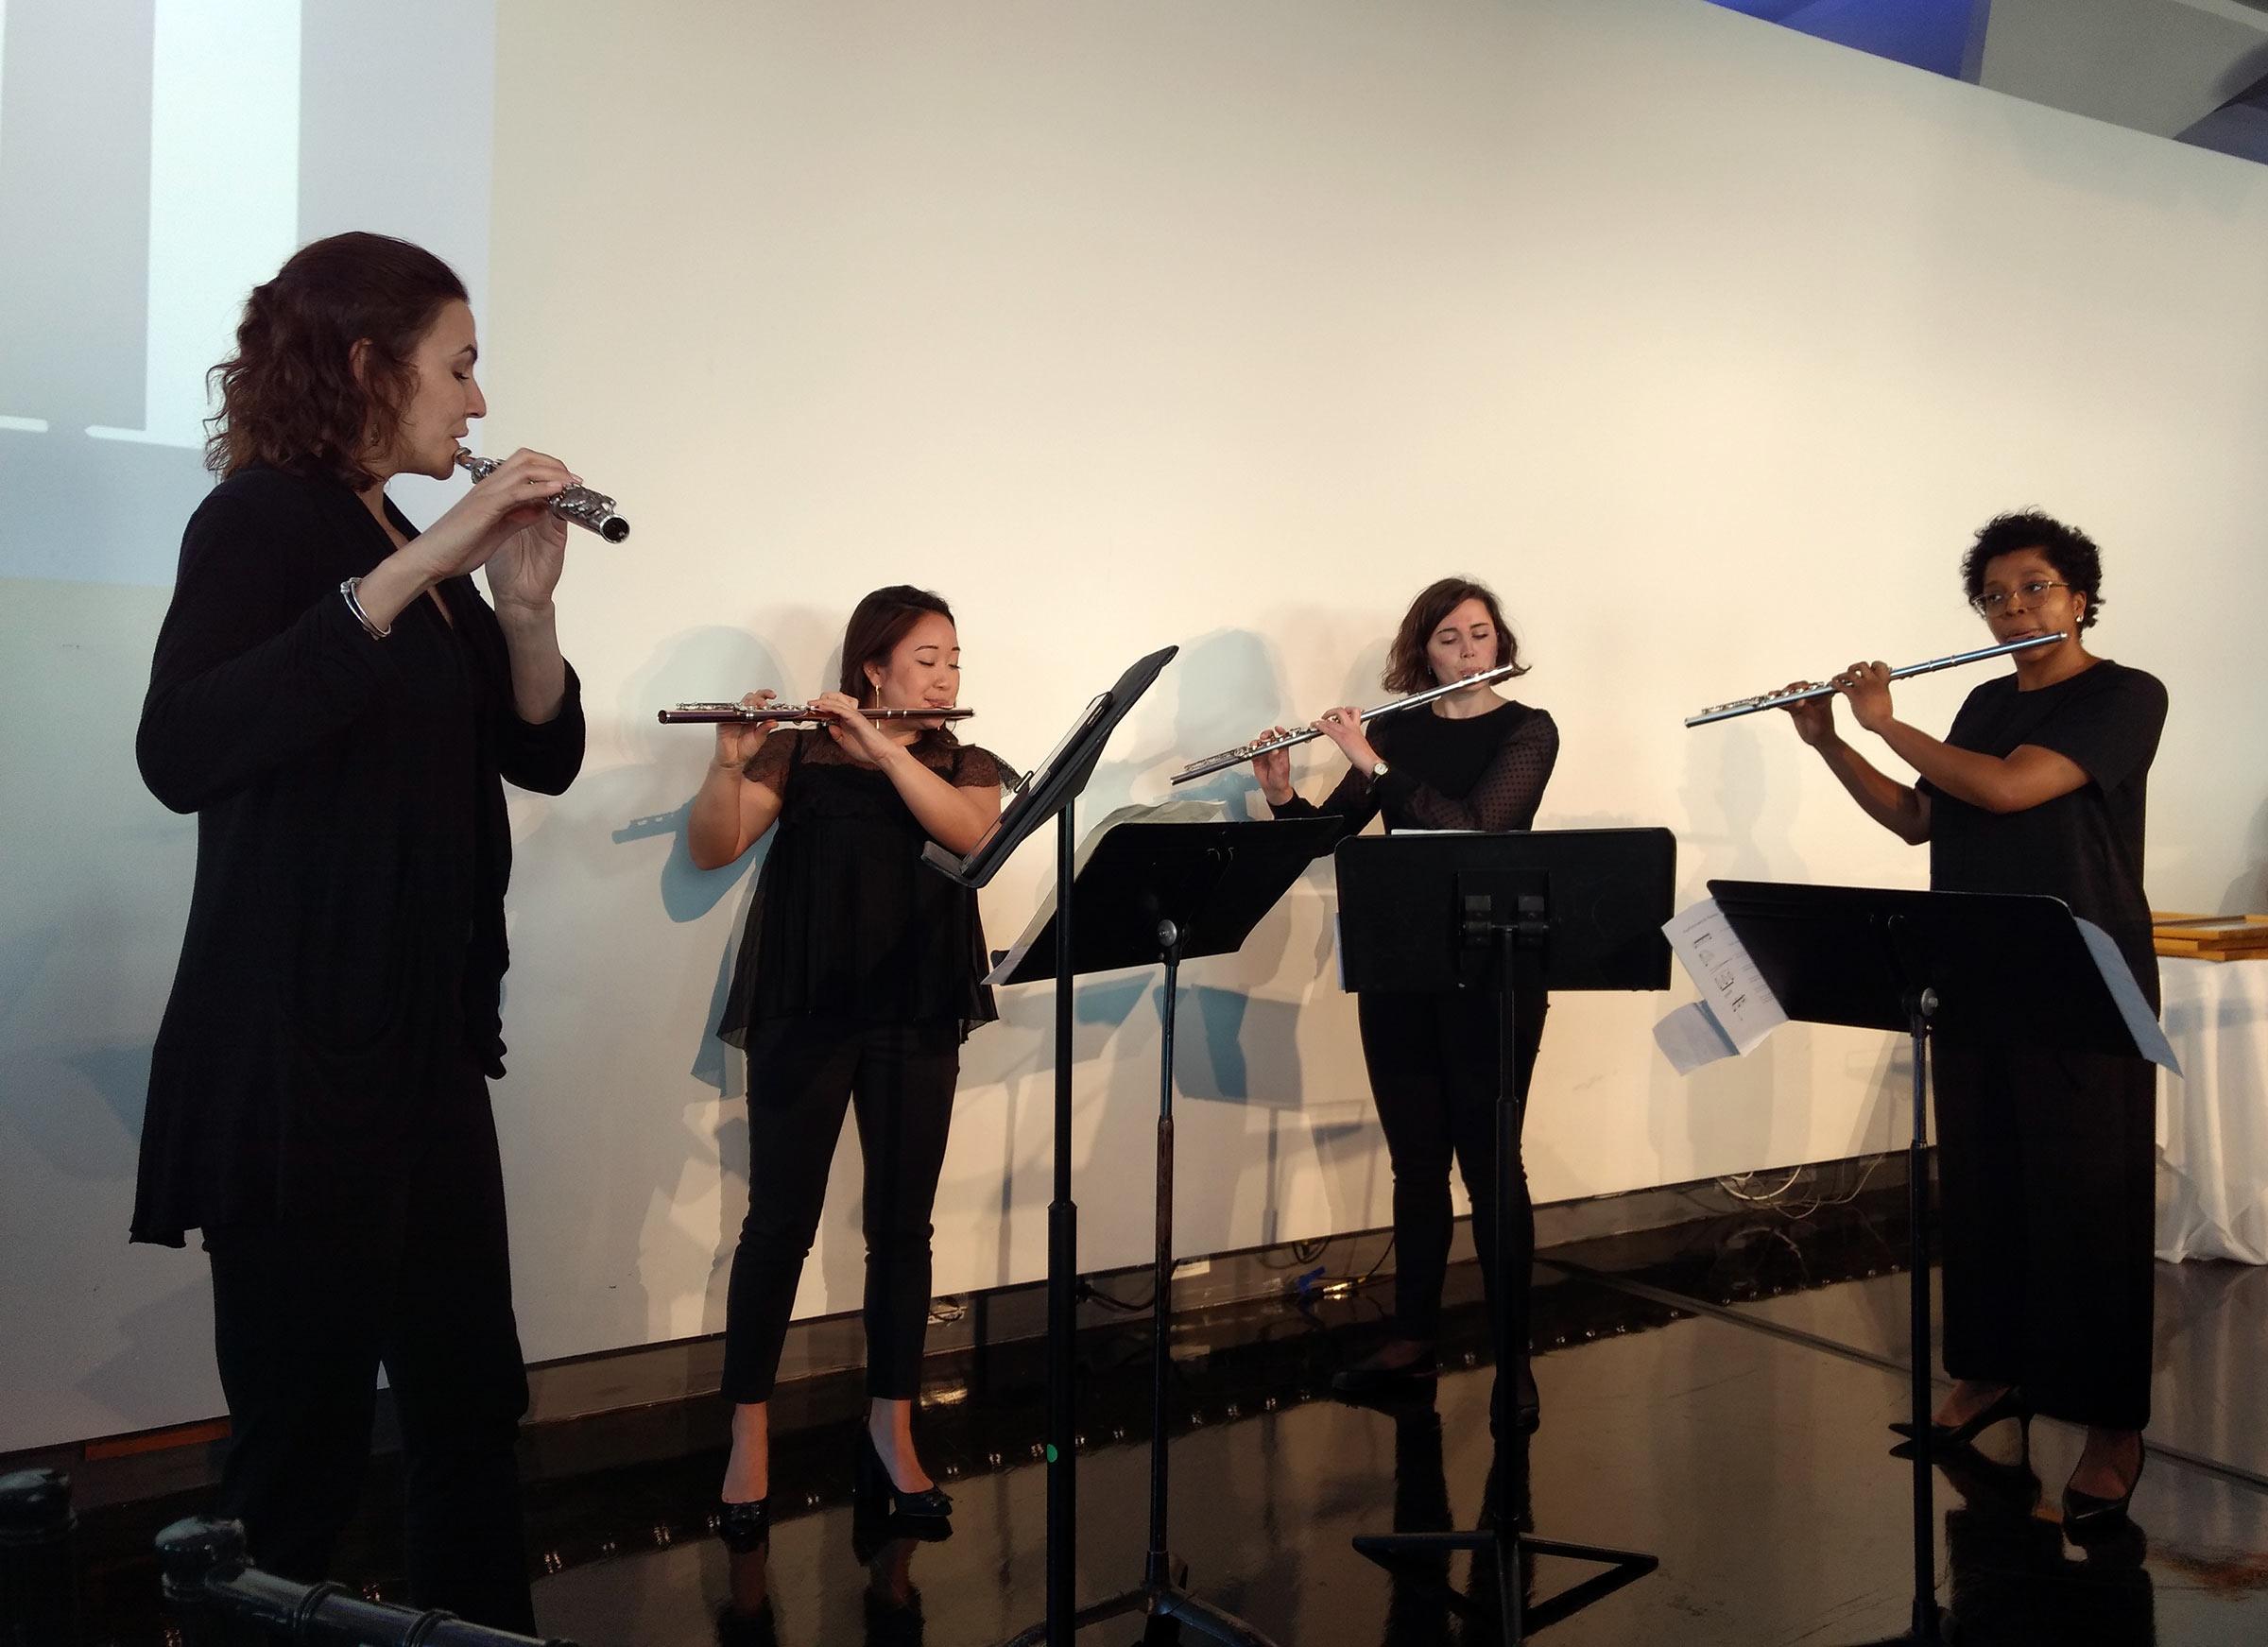 Flute quartet performance during the ceremony.